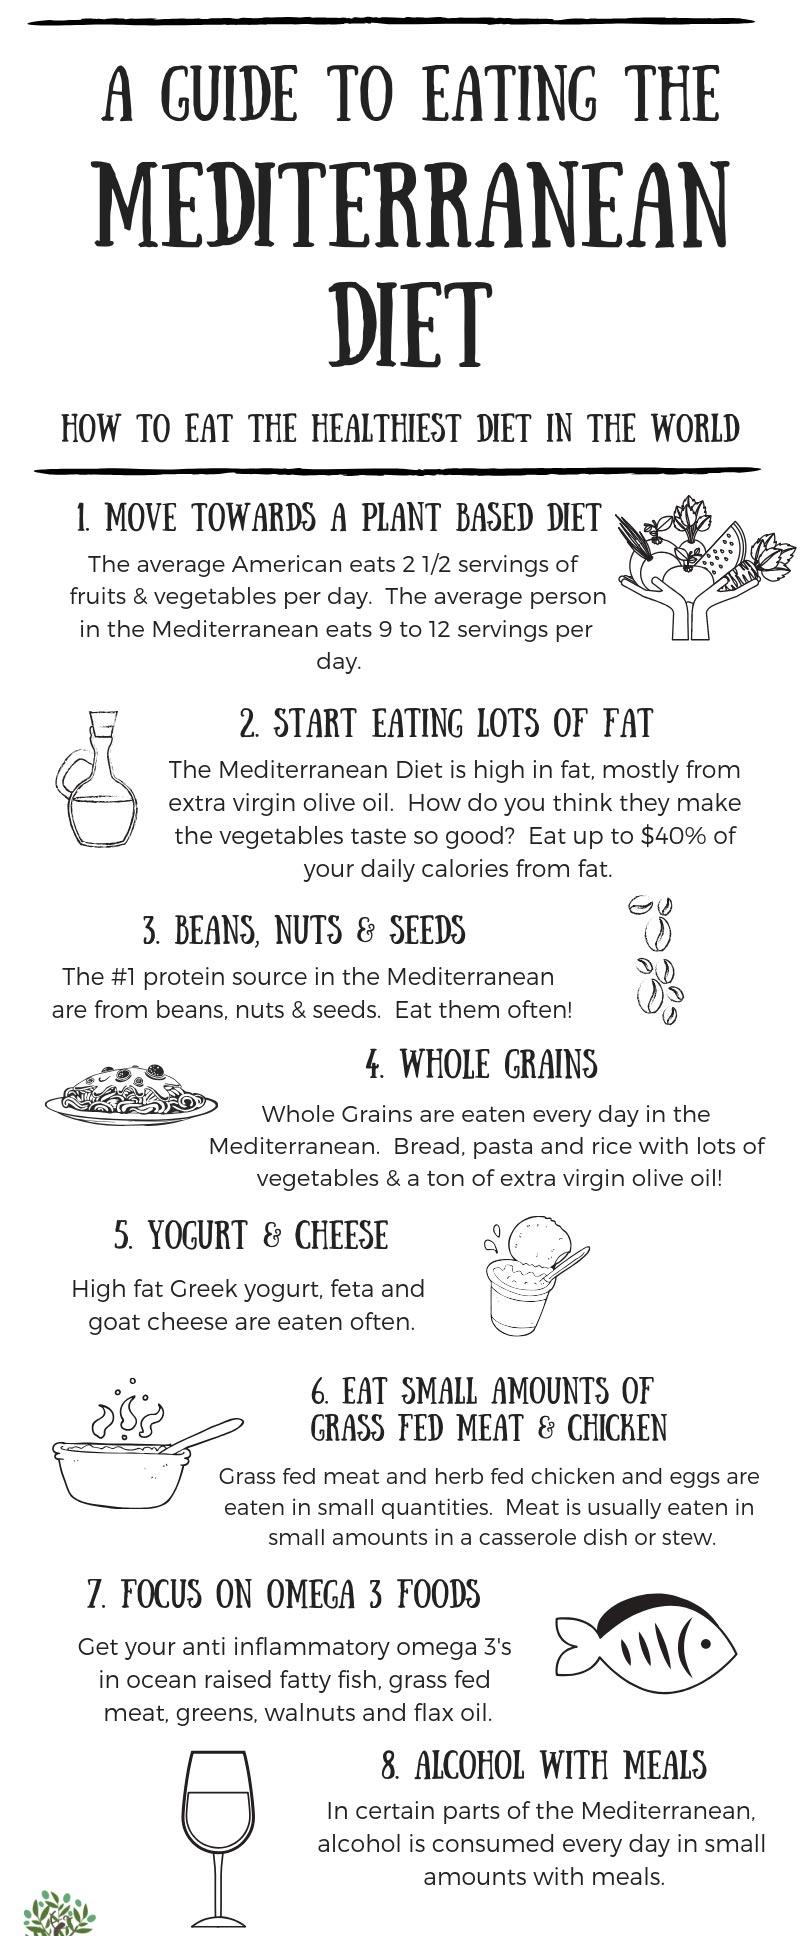 Guide to Eating Mediterranean Diet